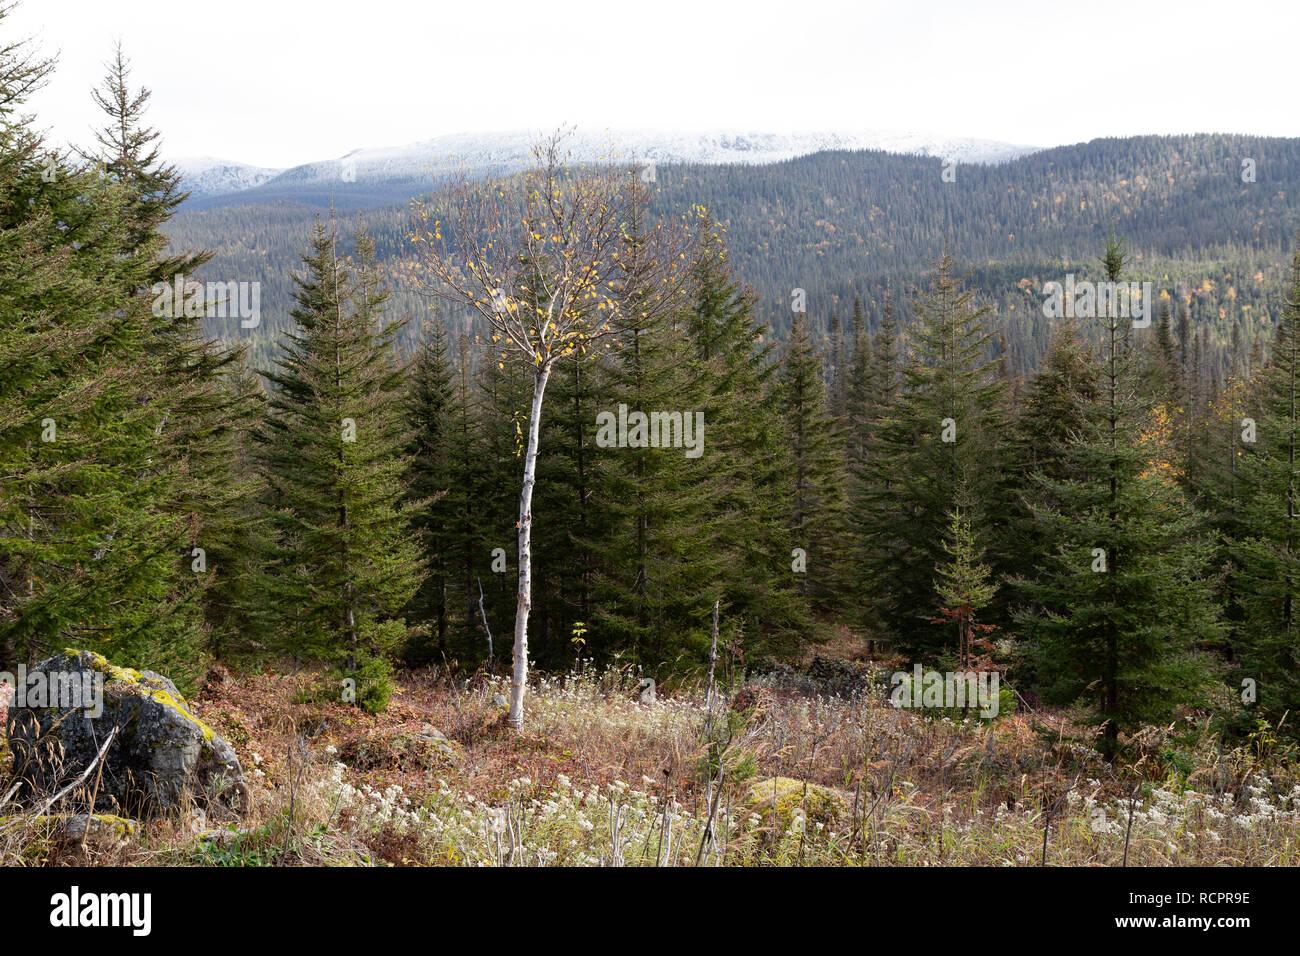 Woodland in Gaspésie National Park (Parc National de la Gaspésie) on the Gaspé Peninsula of Quebec, Canada. - Stock Image